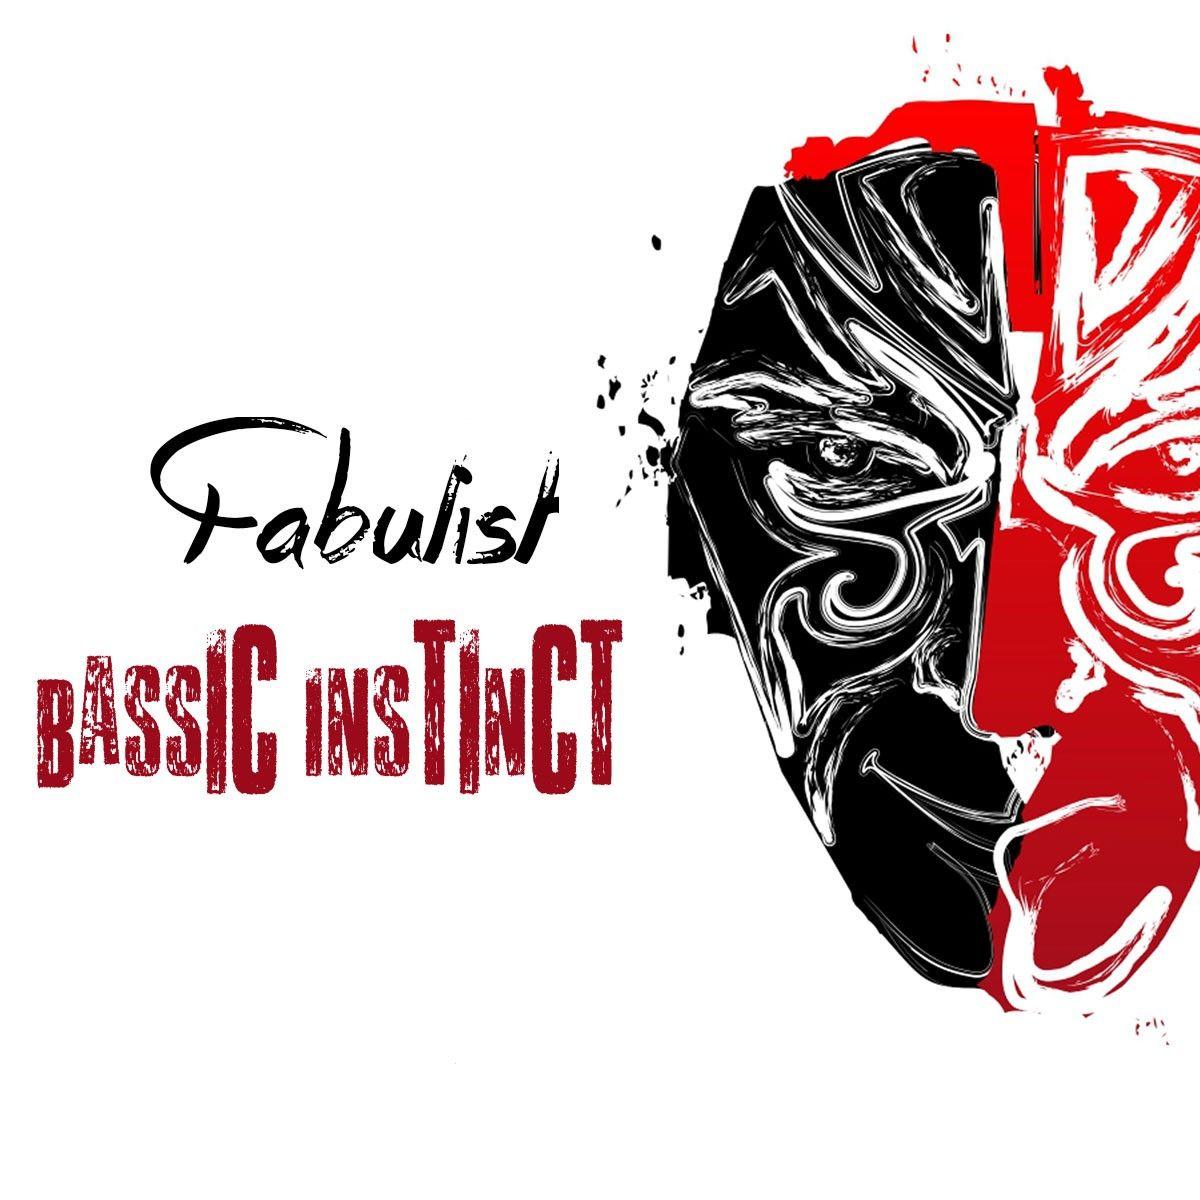 fabulist-bassic-instinct3.jpg